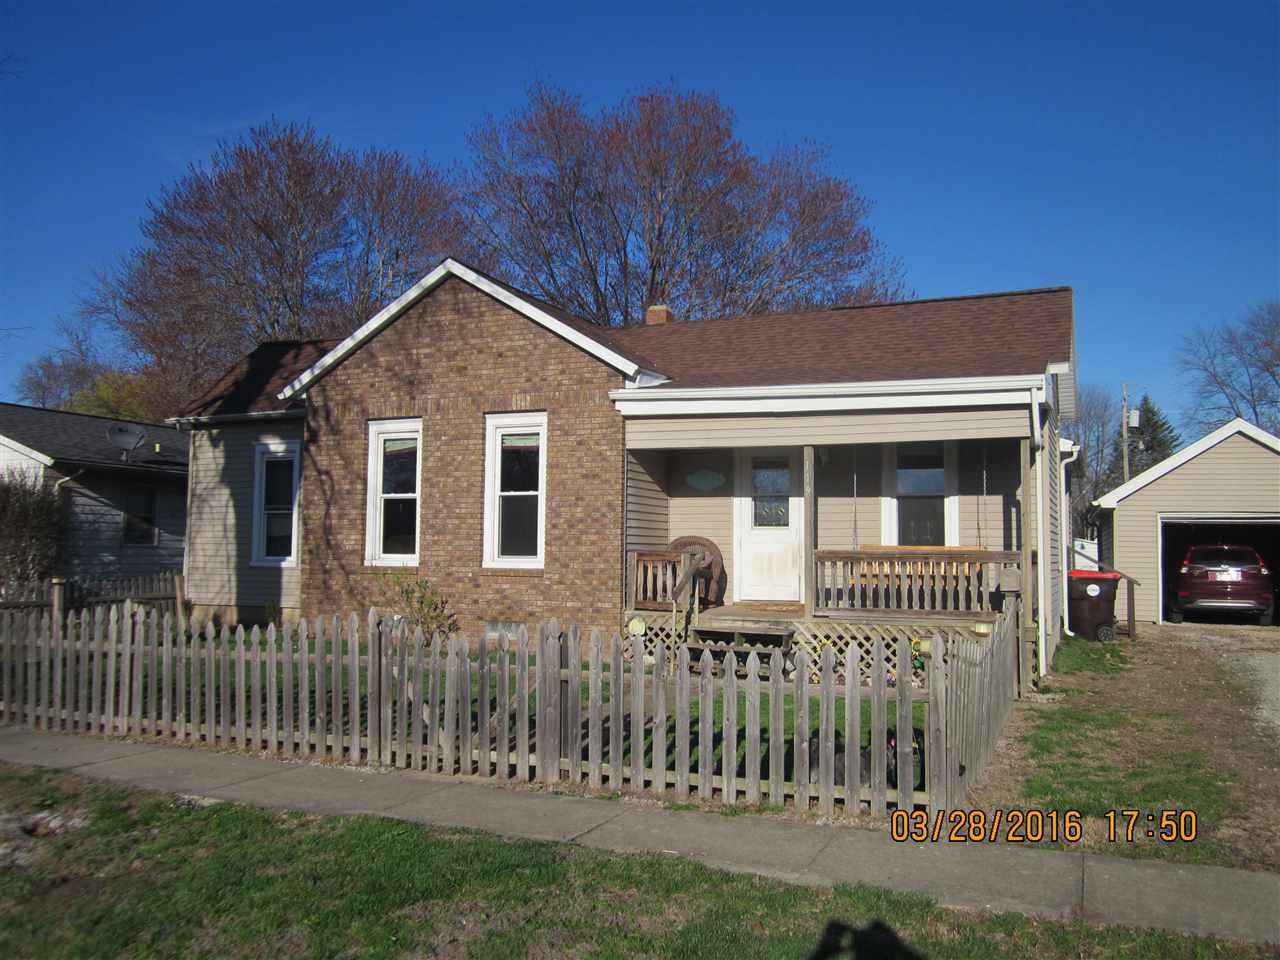 119 N Keefer St, Mason City, IL 62664